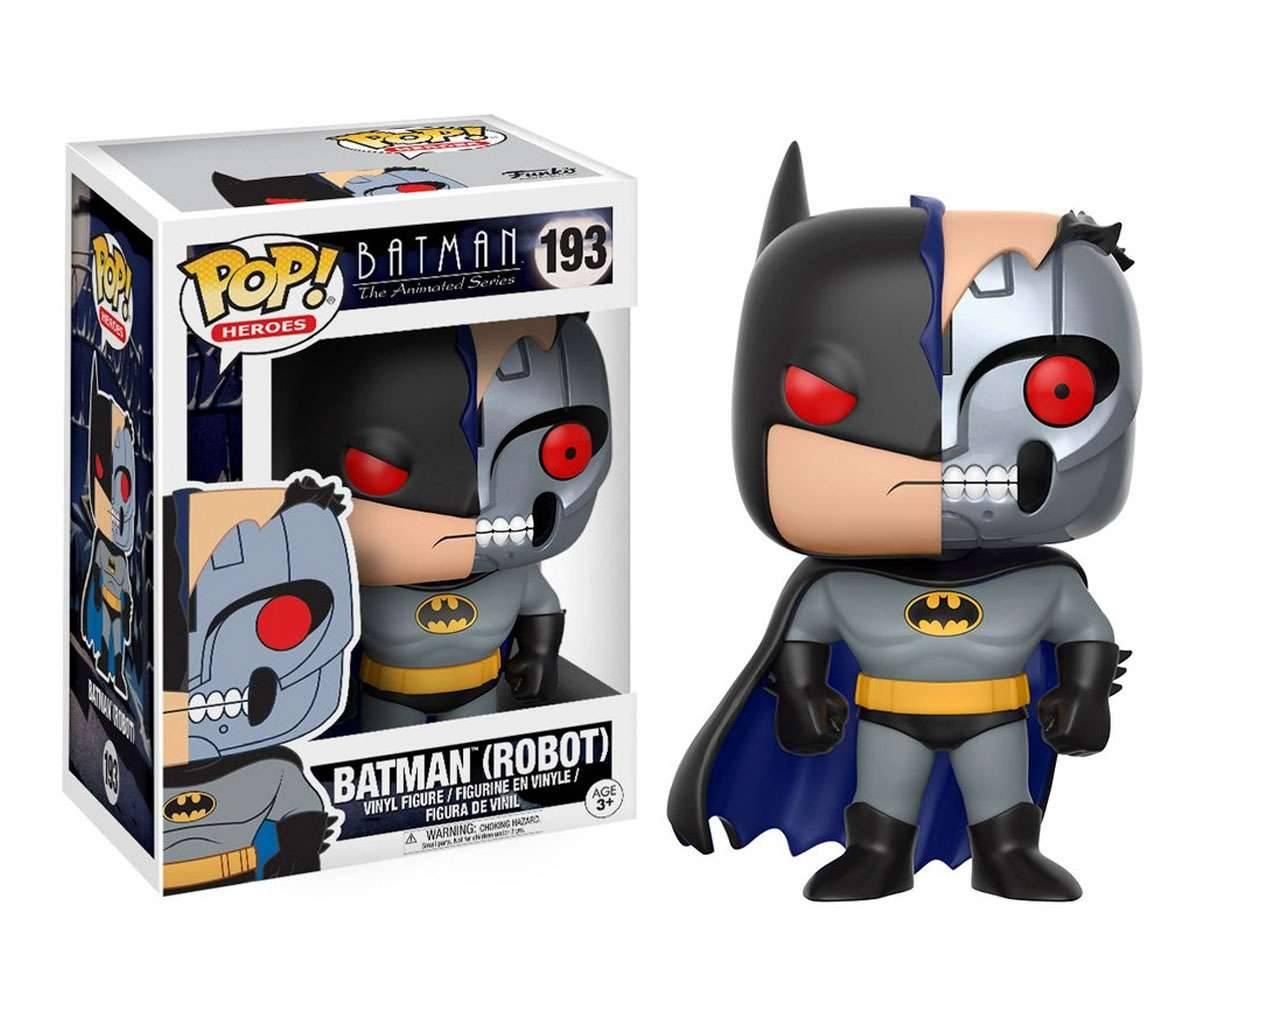 Batman Robot The Animated Series Pop! Vinyl